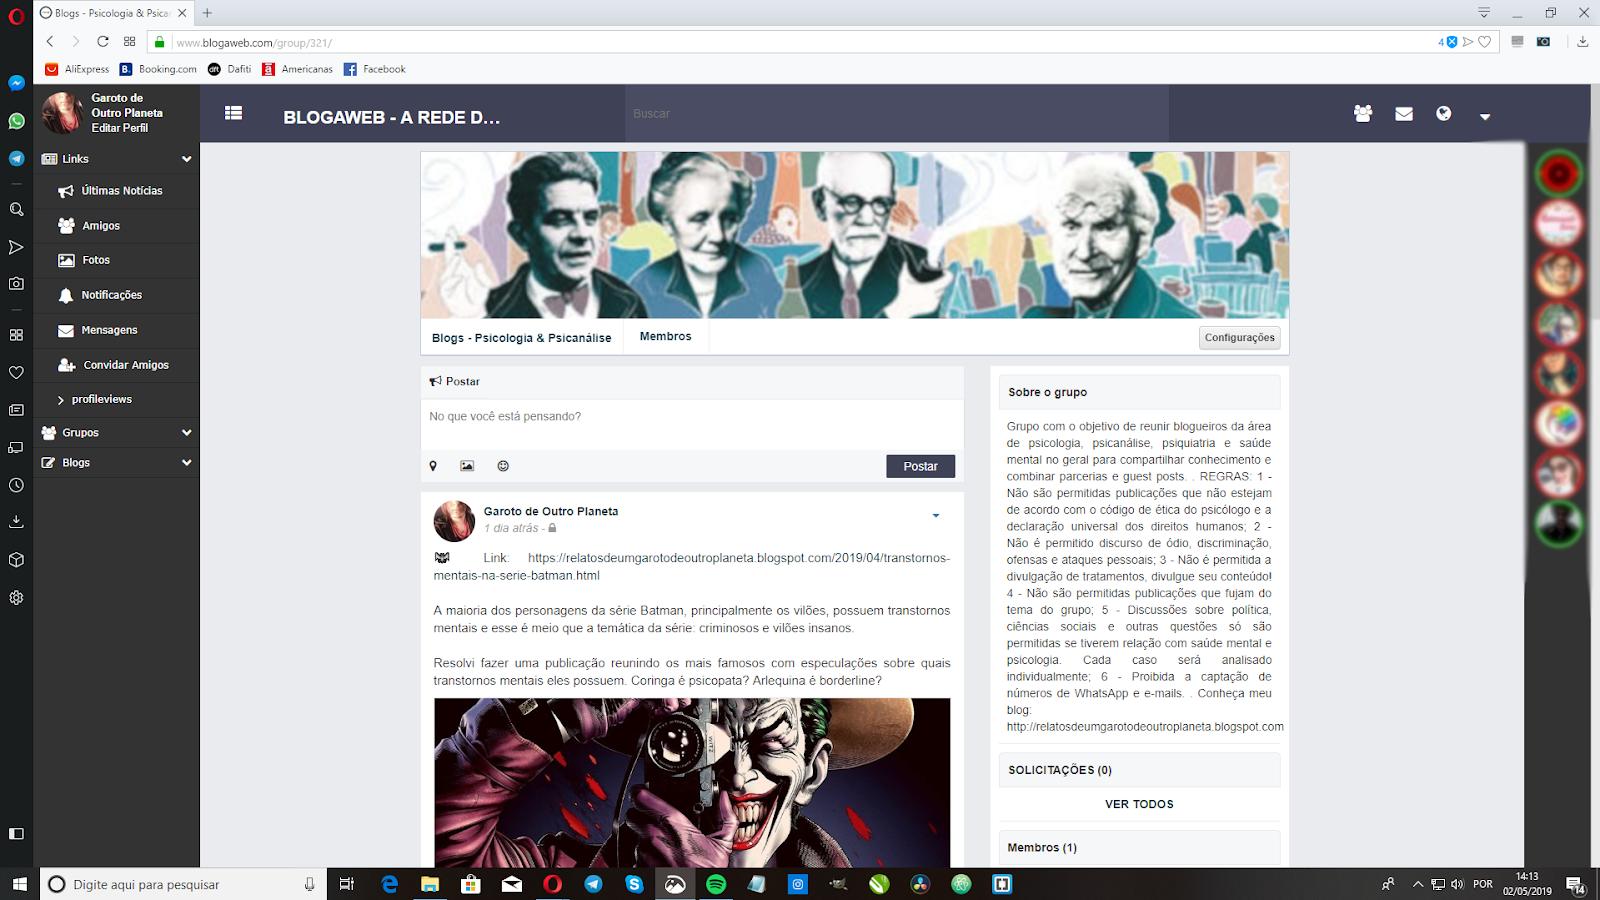 Grupo 'Blogs - Psicologia e Psicanálise' na BlogaWeb